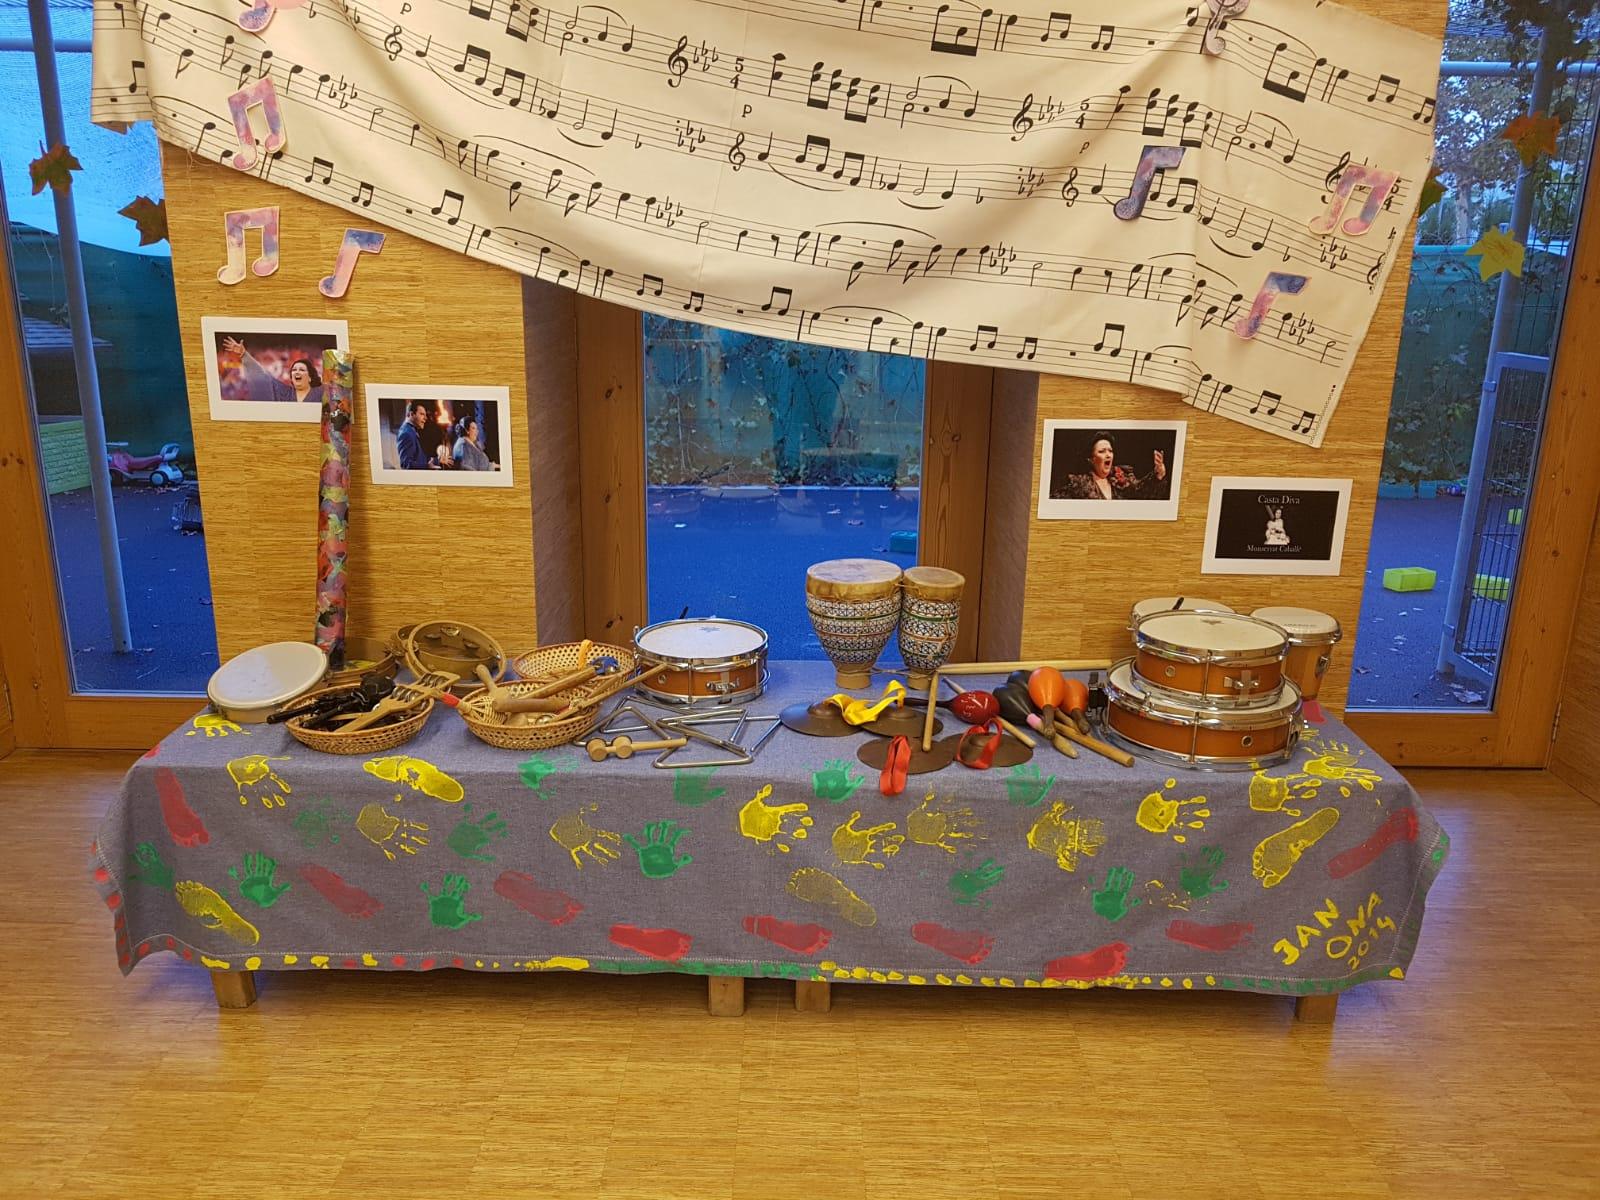 Instruments a la sala central.